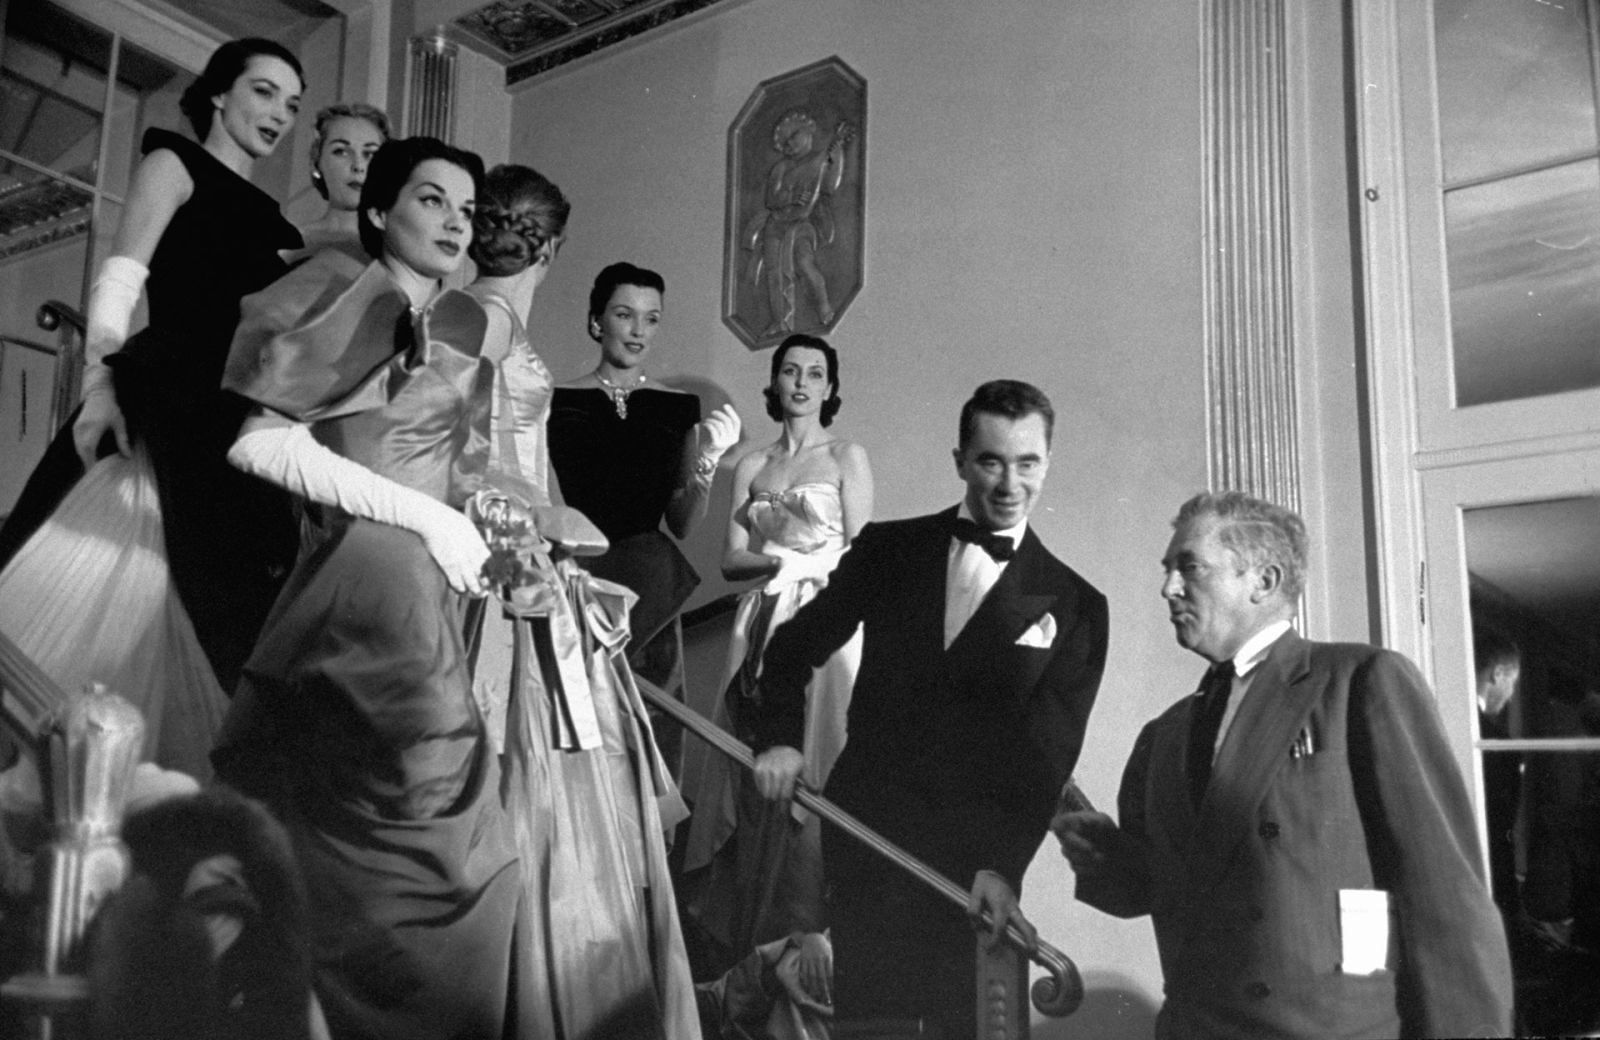 Чарльз Джеймс с моделями за кулисами модного показа